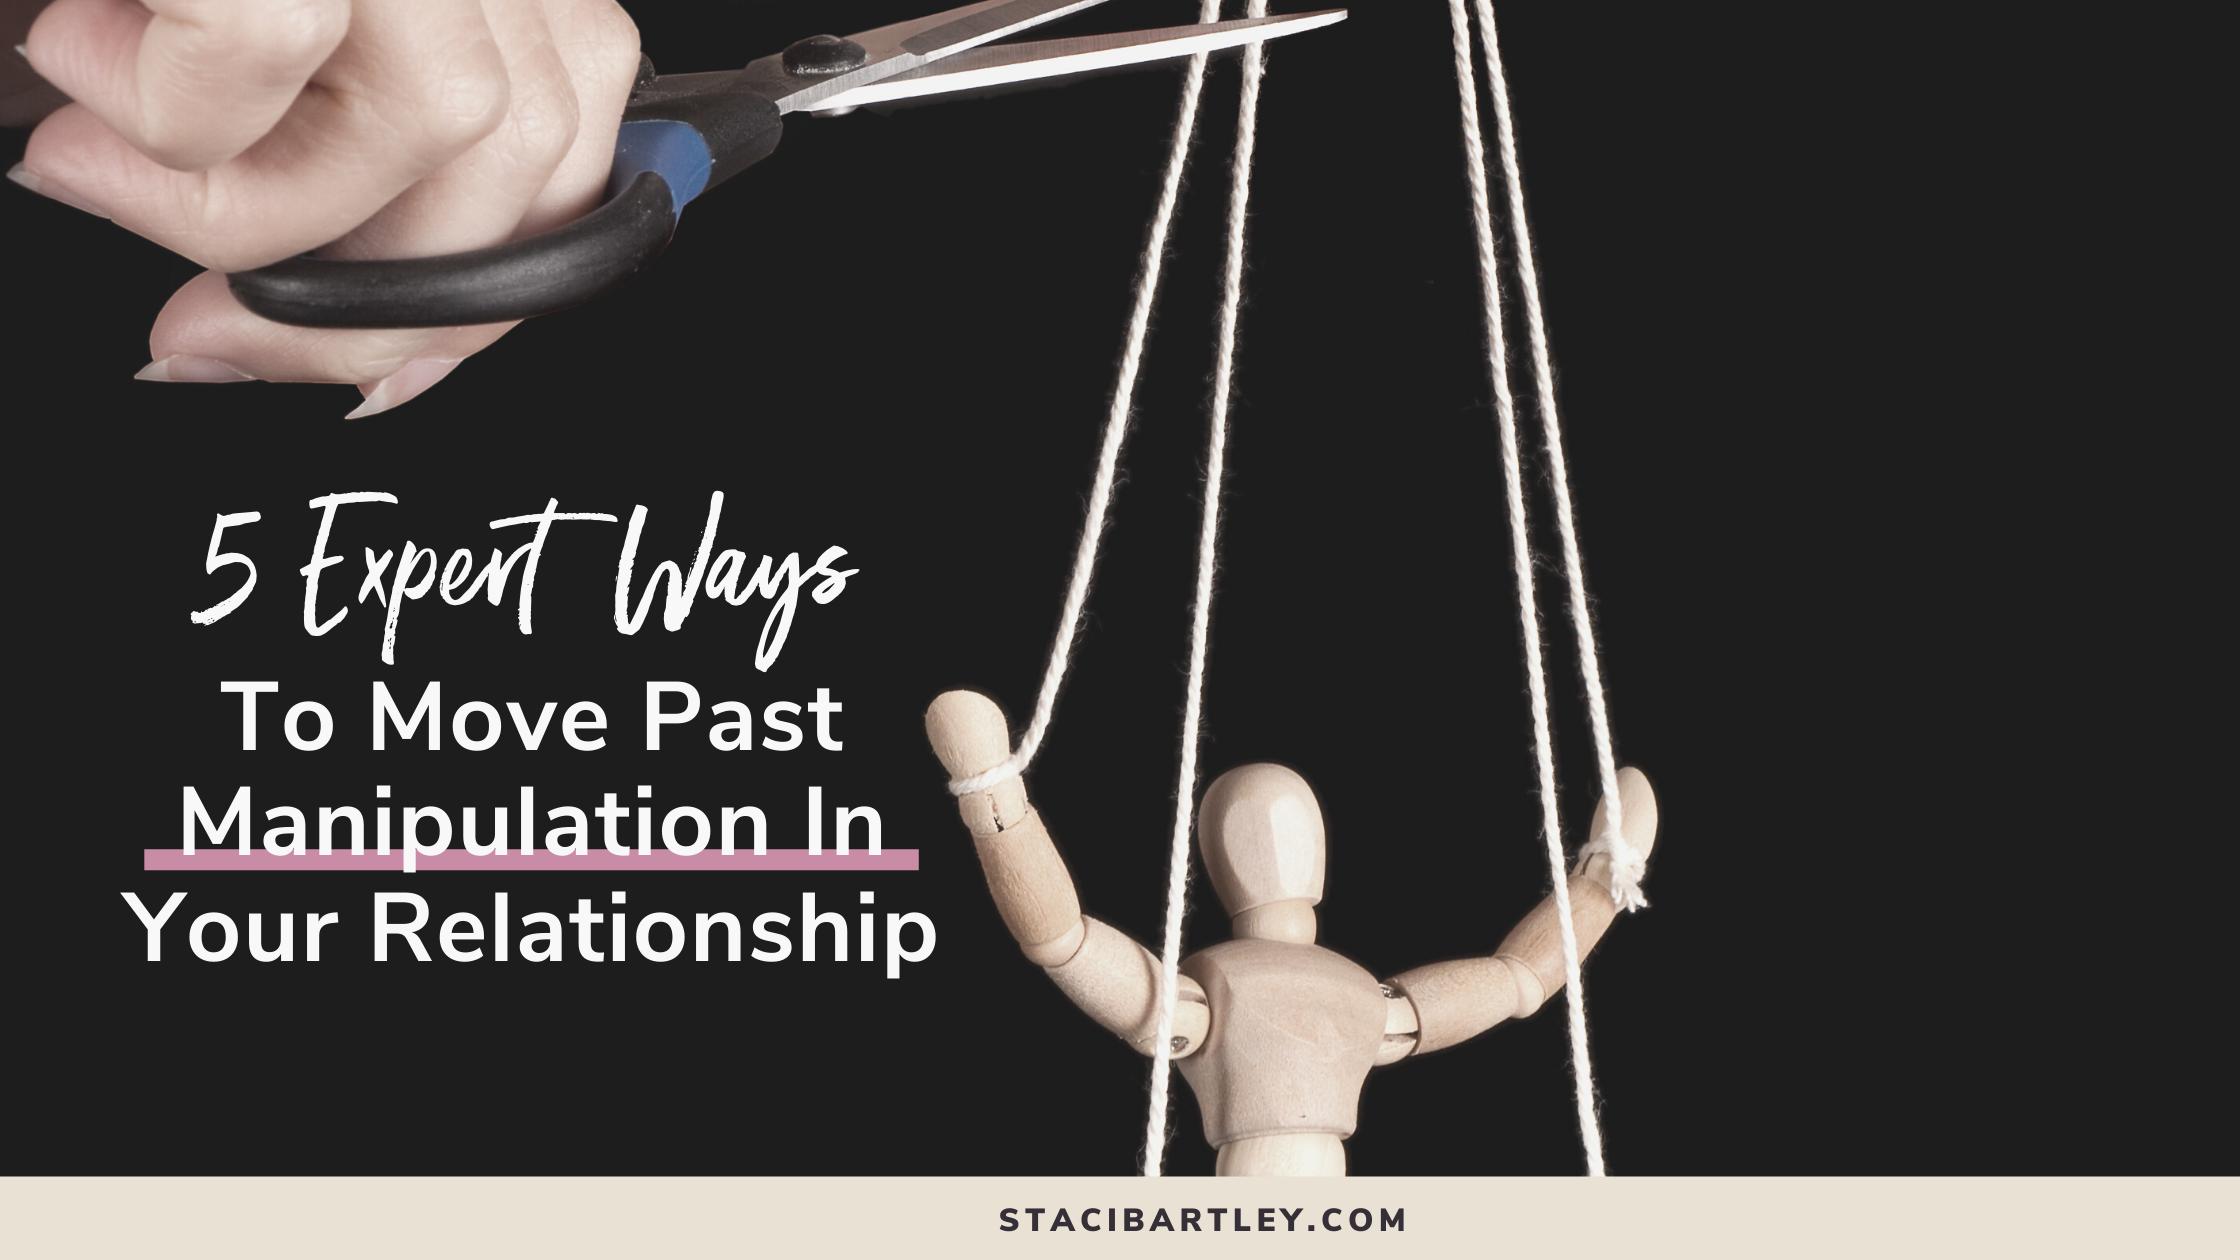 5 Expert Ways To Move Past Manipulation